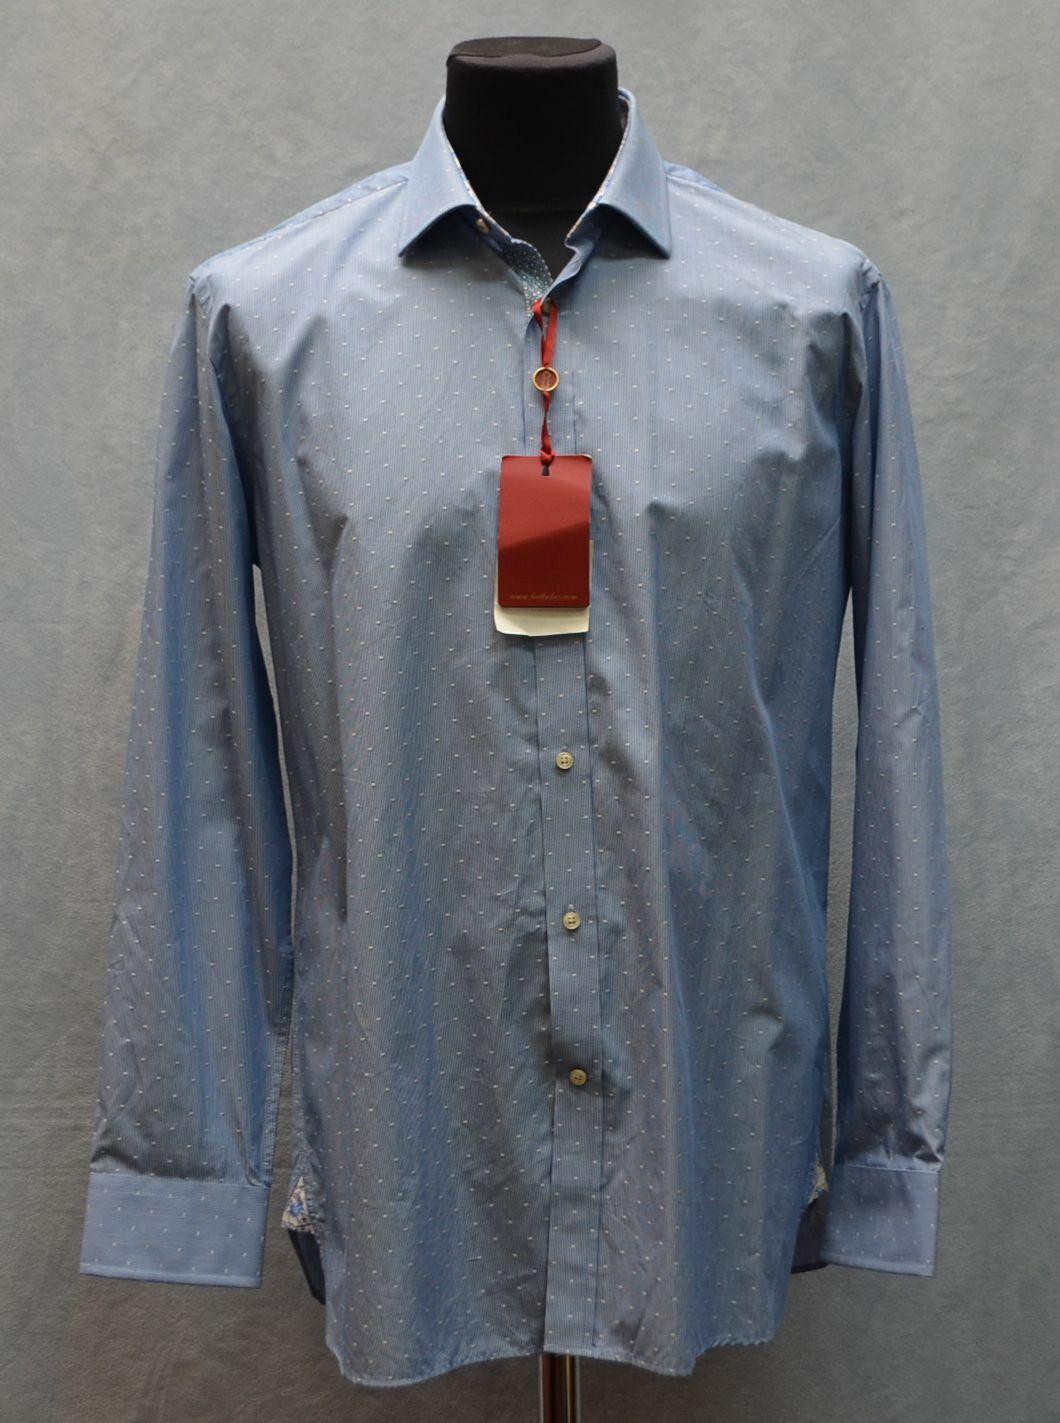 A5  NWT TED BAKER Endurance Blau Dot Cotton Long Sleeve Shirt Größe 34 35    120